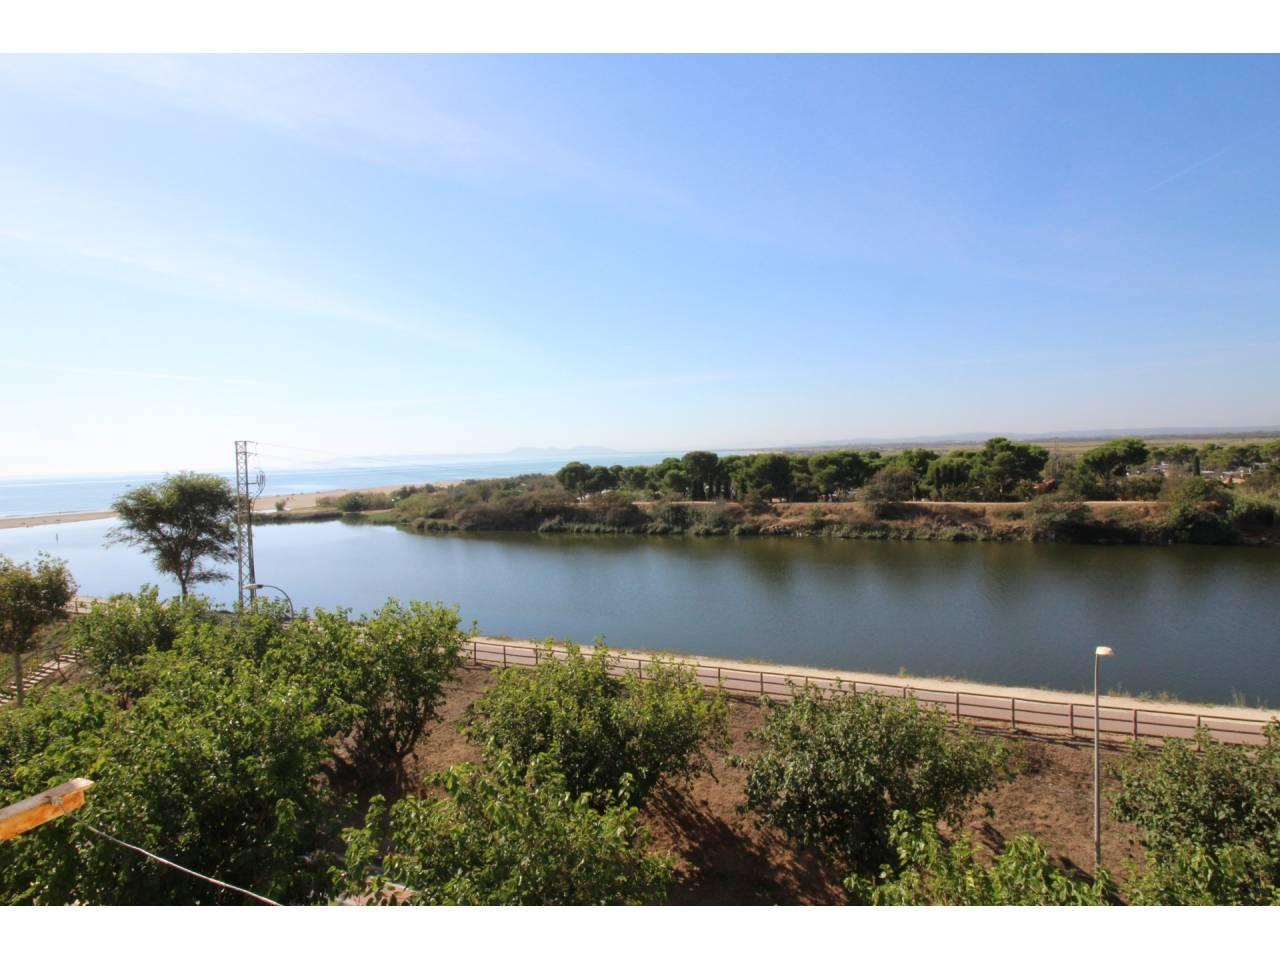 005085 - RESIDENCIA DEL SOL Studio overlooking the sea and river